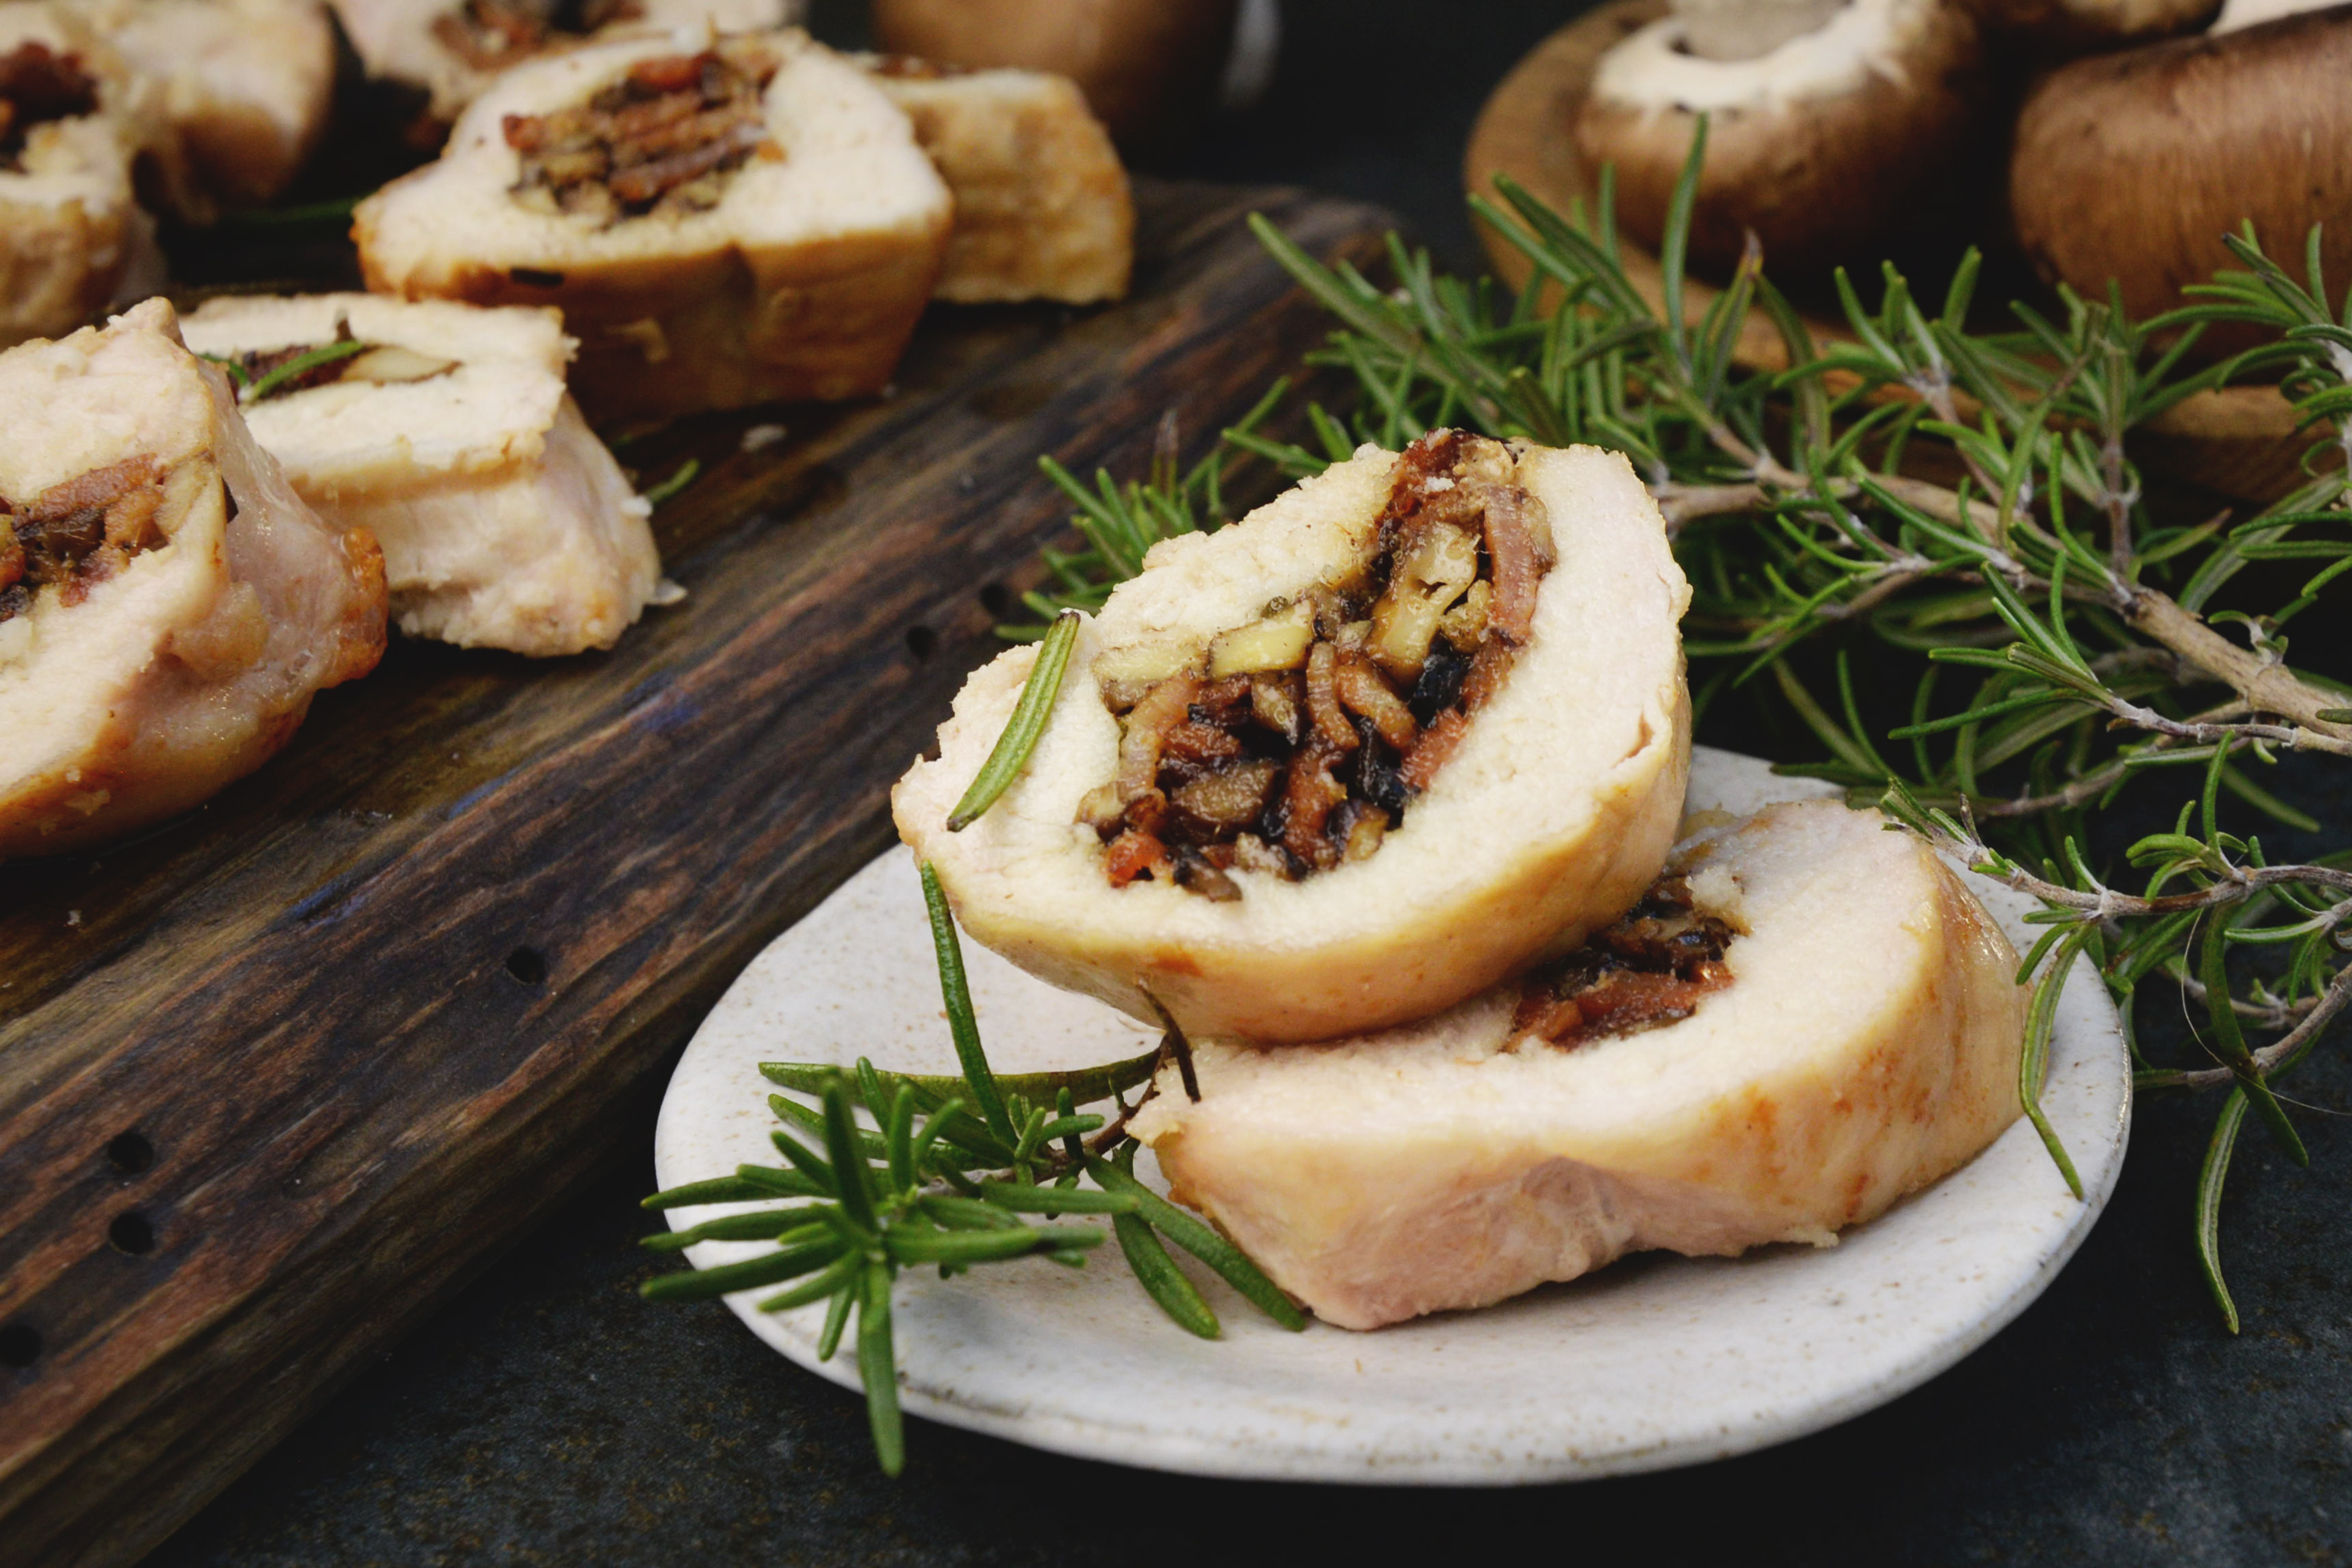 Mushroom and Bacon Stuffed Chicken Breasts